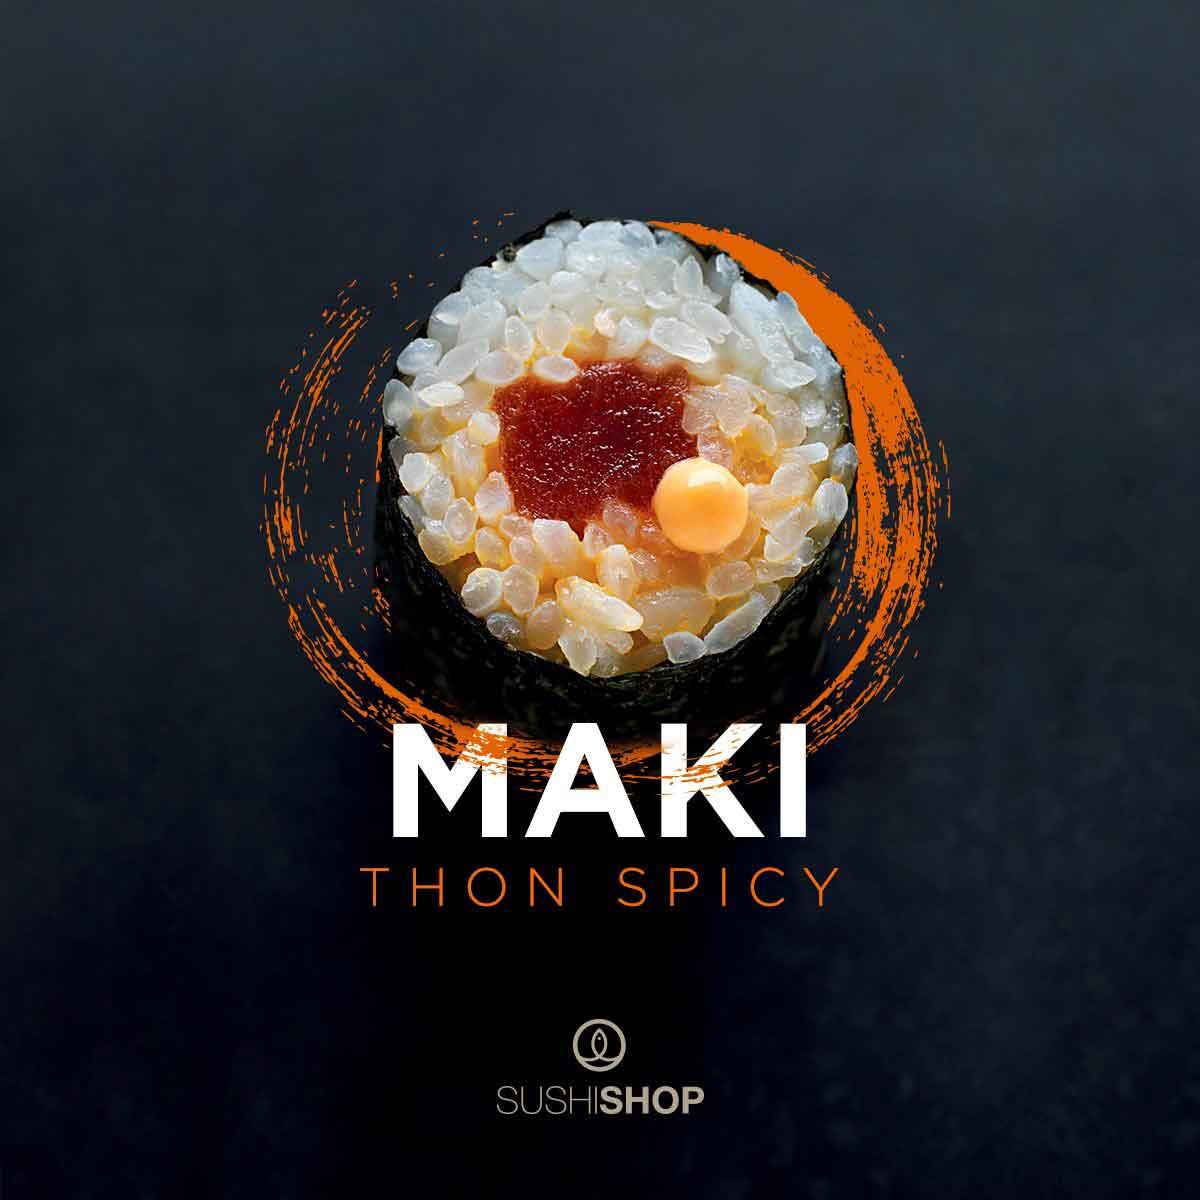 sushi-shop-maki-thon-spicy